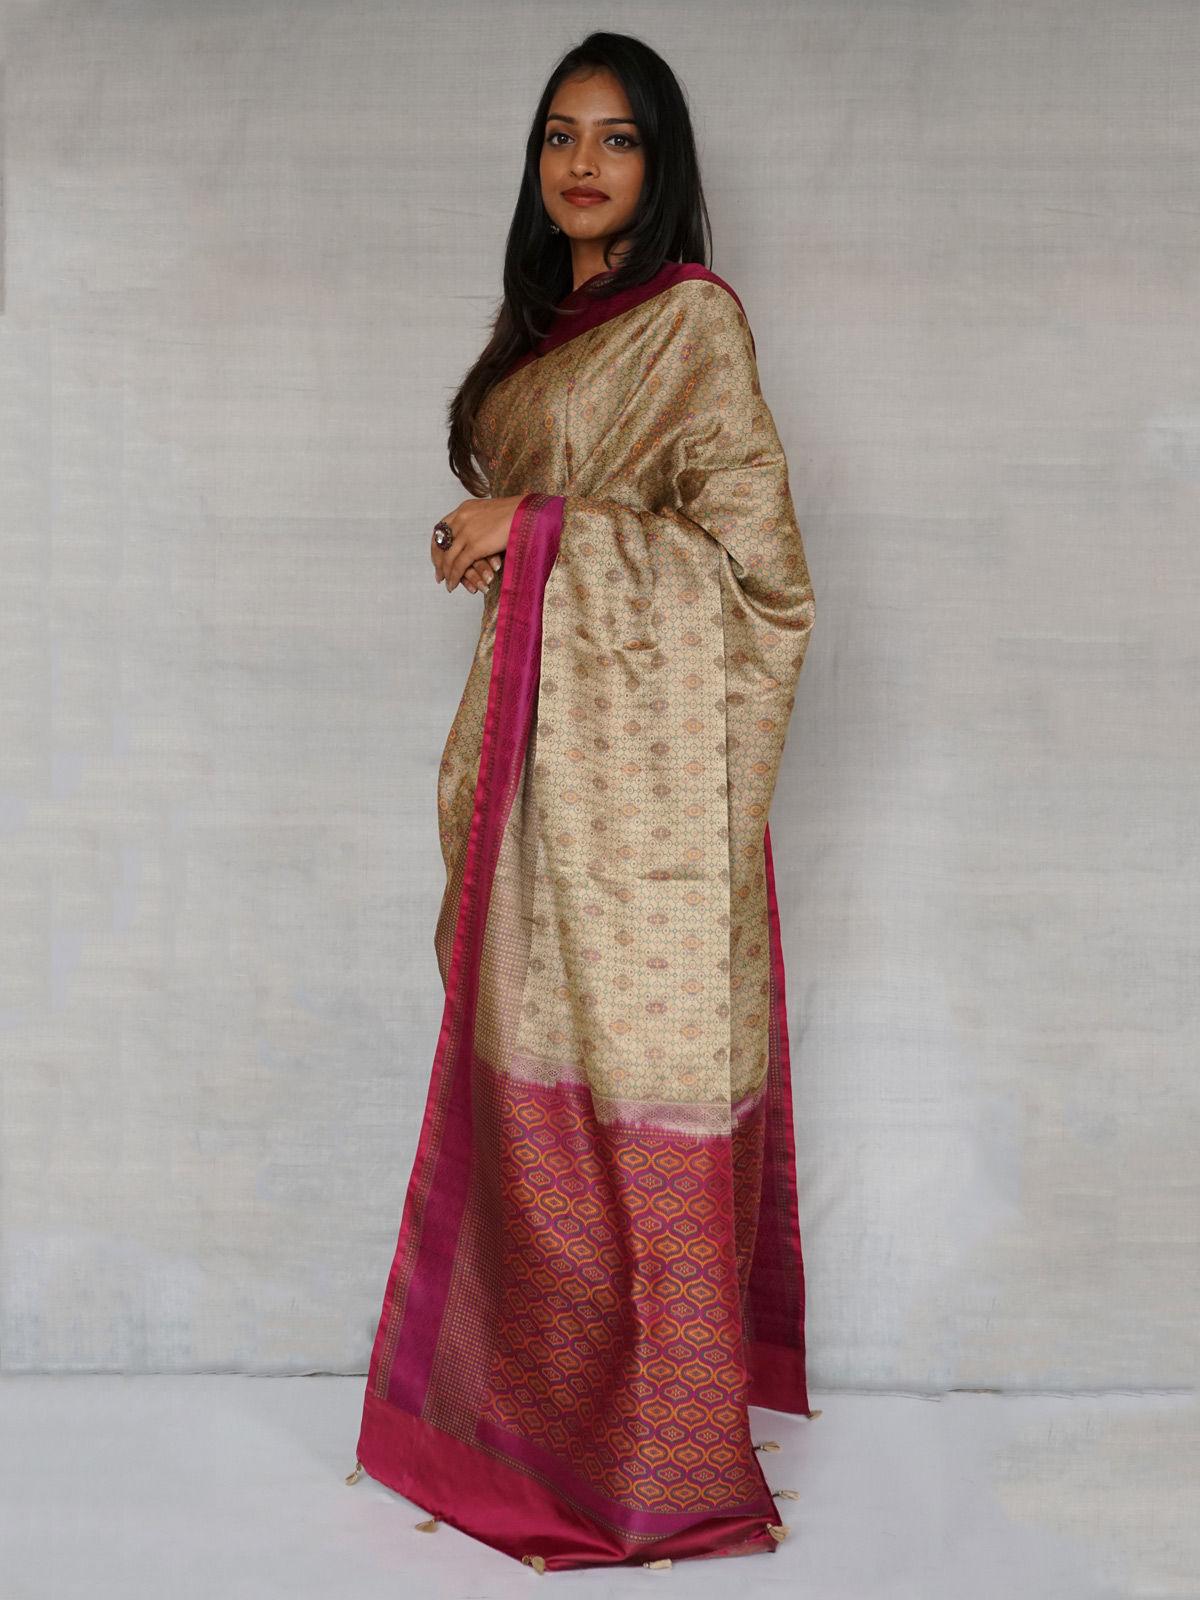 Beige and purple Tanchoi banarasi  pure  Silk saree  with blouse.